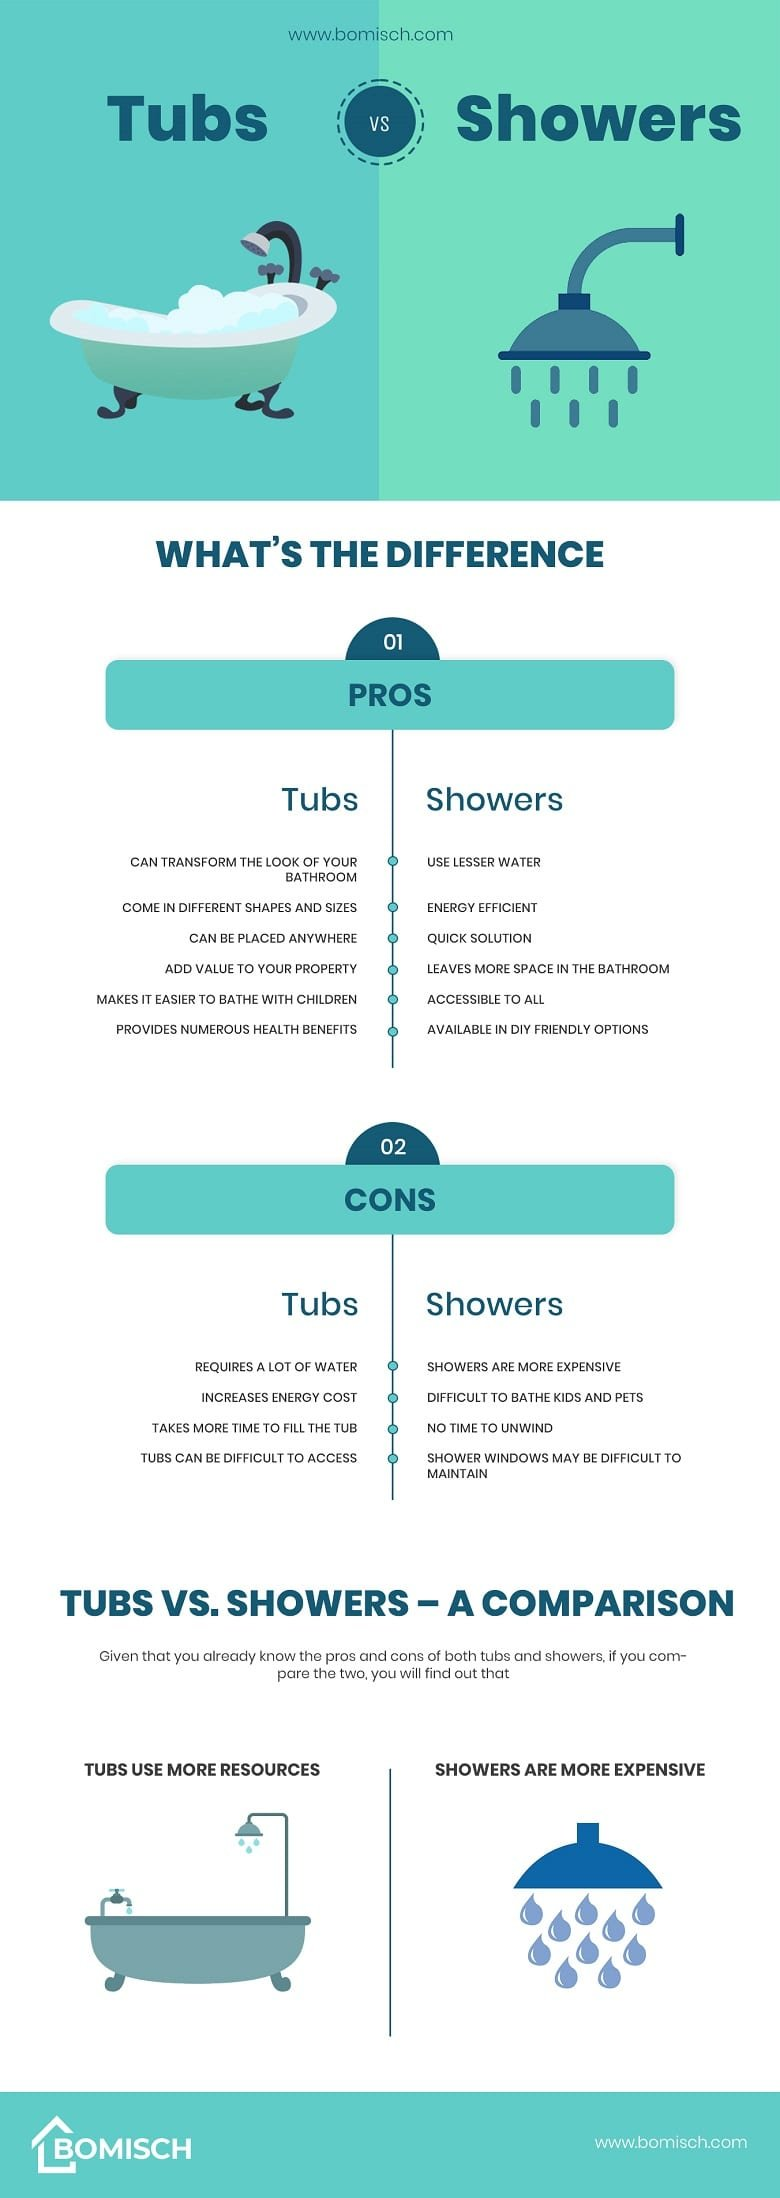 Tubs vs Showers